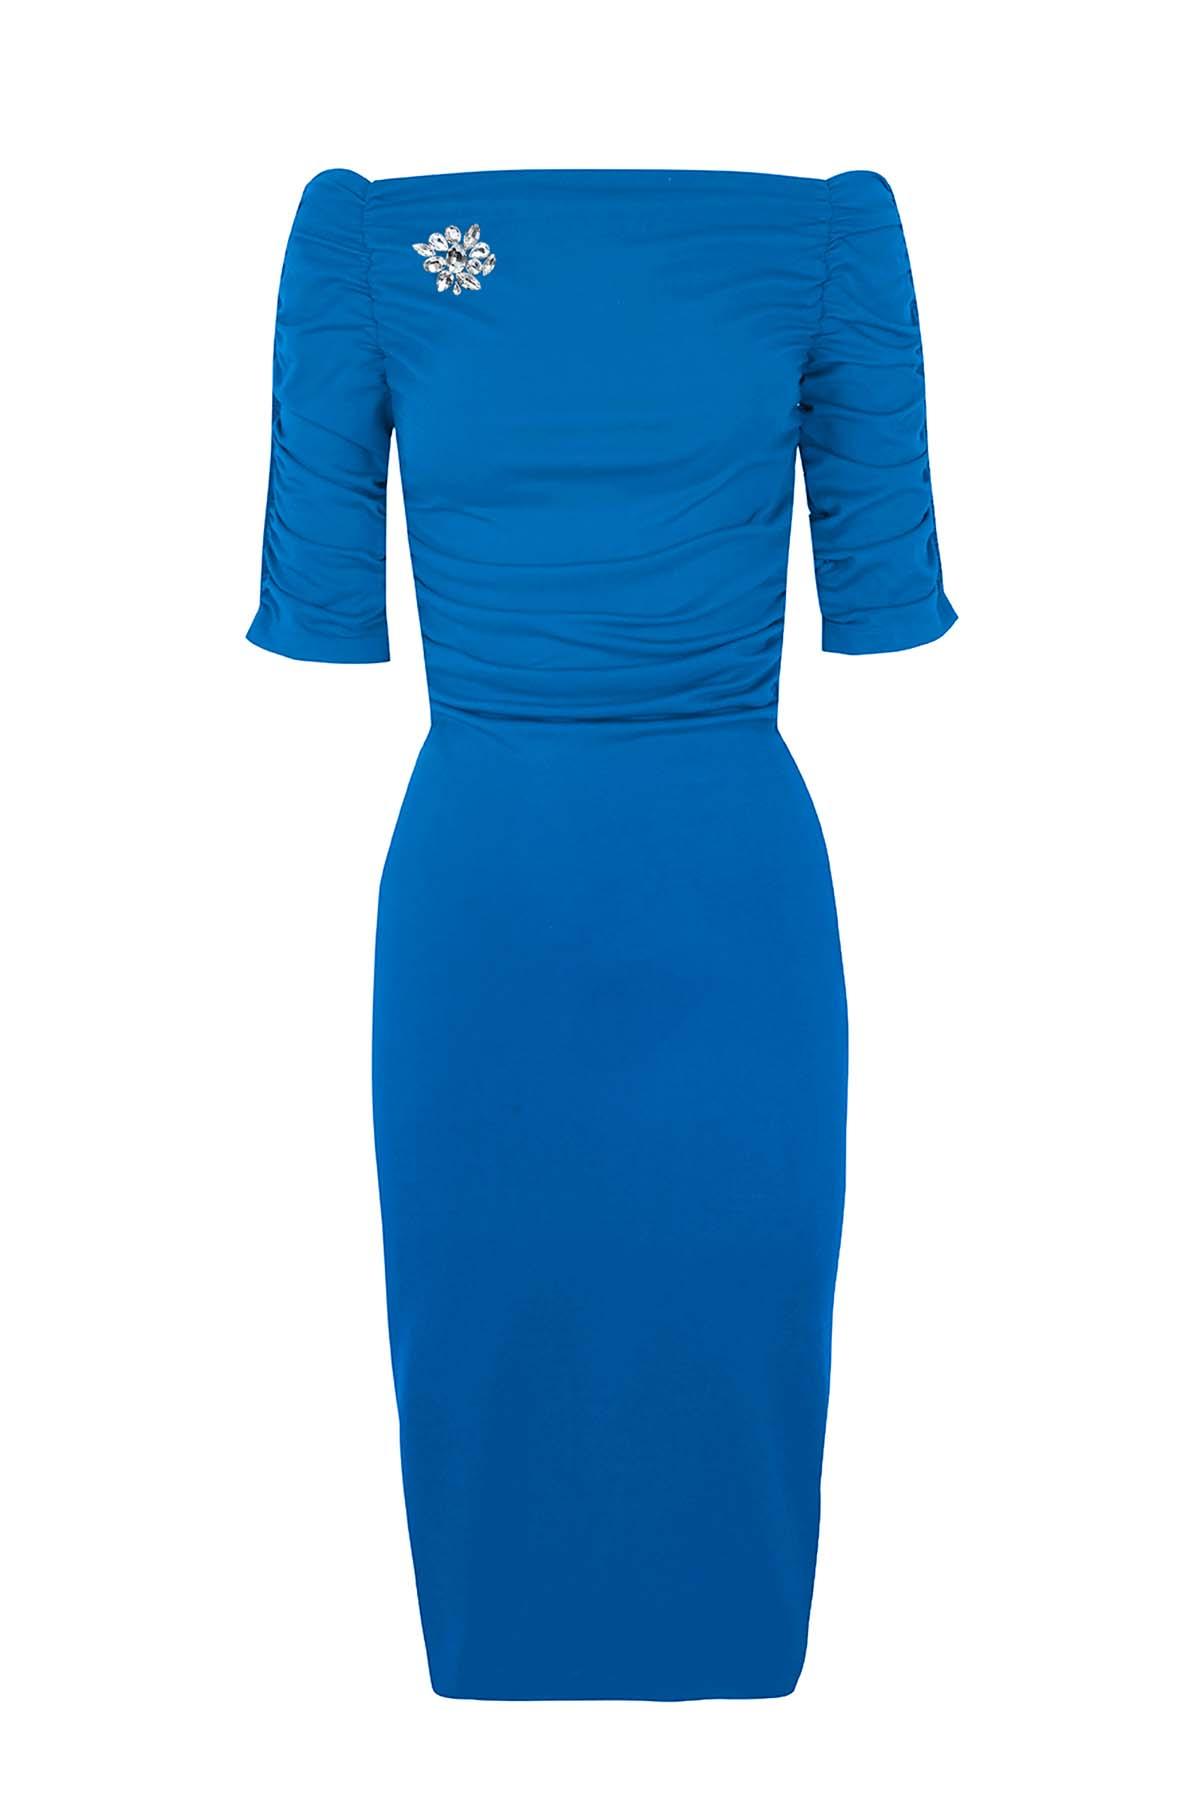 Teria Yabar - Vestido azul Luxembourg